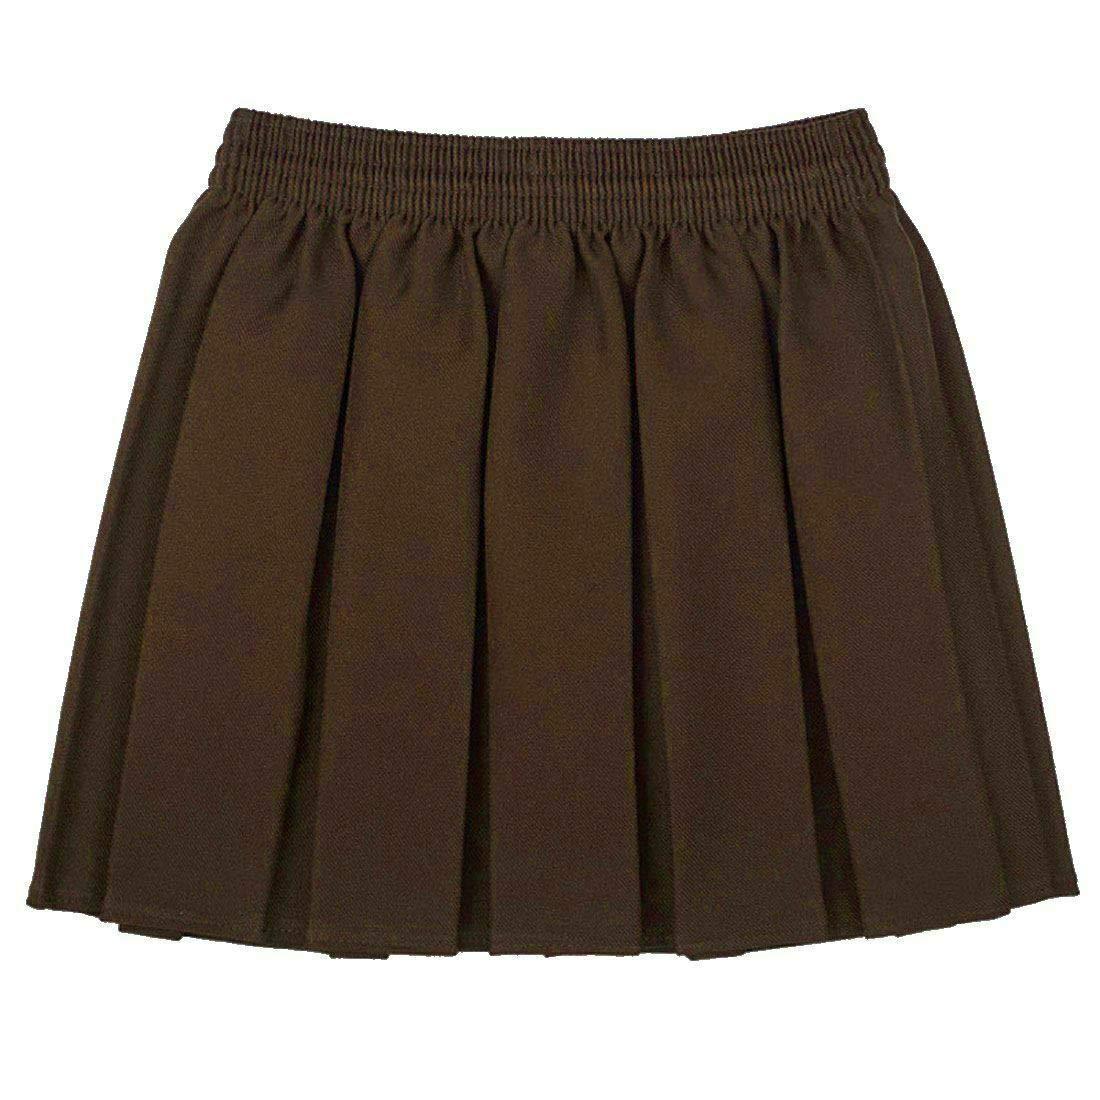 Fashions island Girls Black Grey Navy Box Pleated Skirt Kids All Round Elasticated Mini Skirt